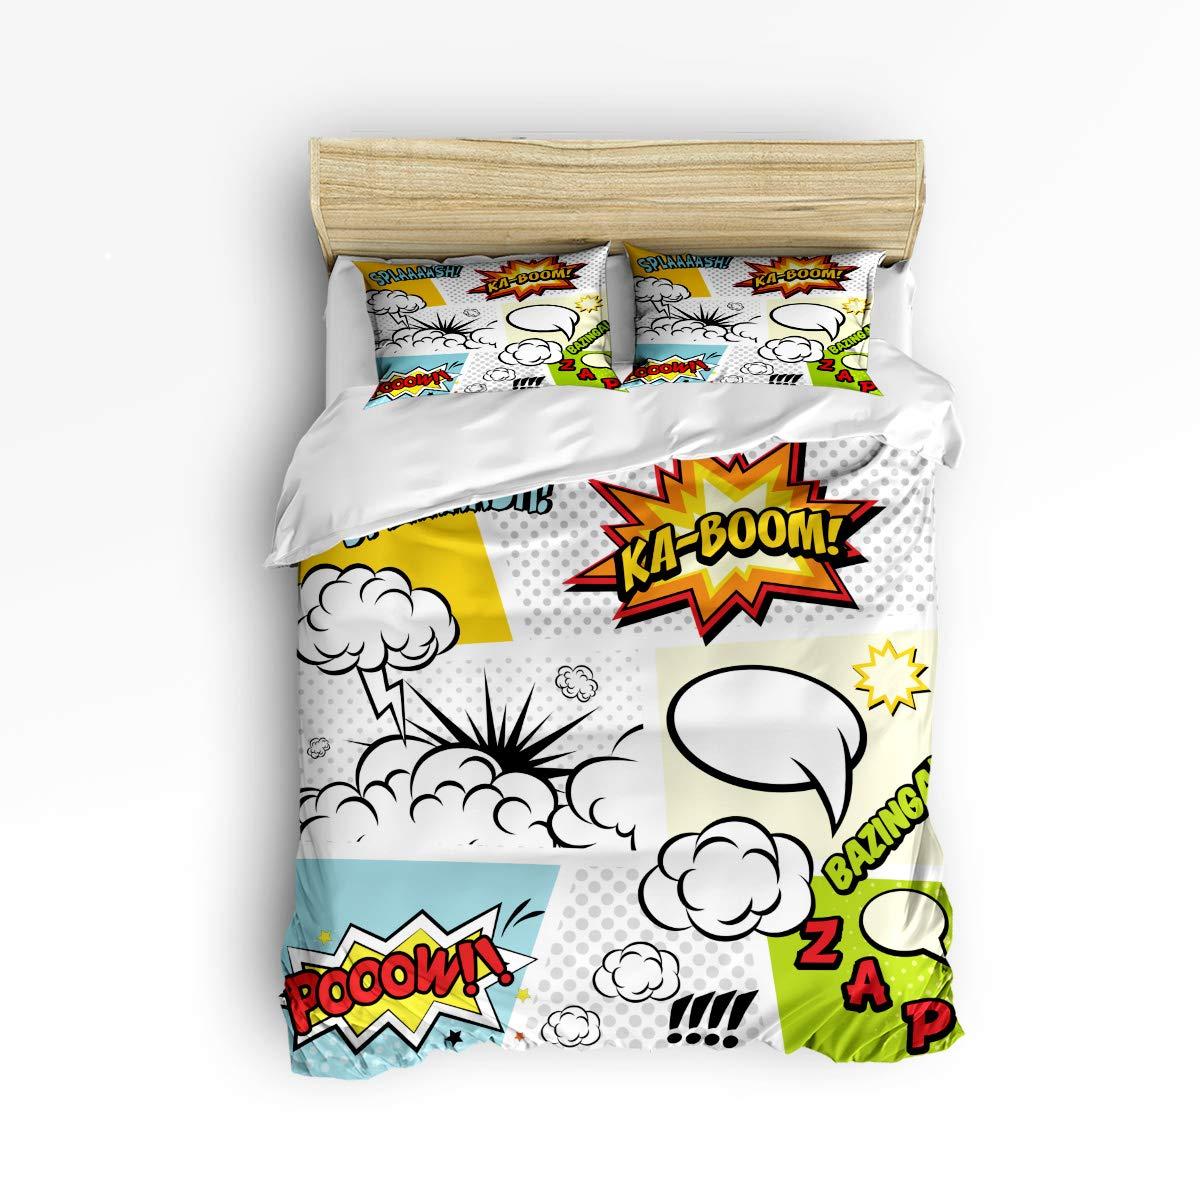 EZON-CH かわいい布団カバー3点セット 子供 男の子 女の子 黄色いカエデの木 ベッドルームの装飾寝具セット 枕カバー2枚付き Queen Size 20190106whlwhlsjsjsSSTW01718SJSCEZN B07MS8W9KL Dialog Box Boomezn1560 Queen Size